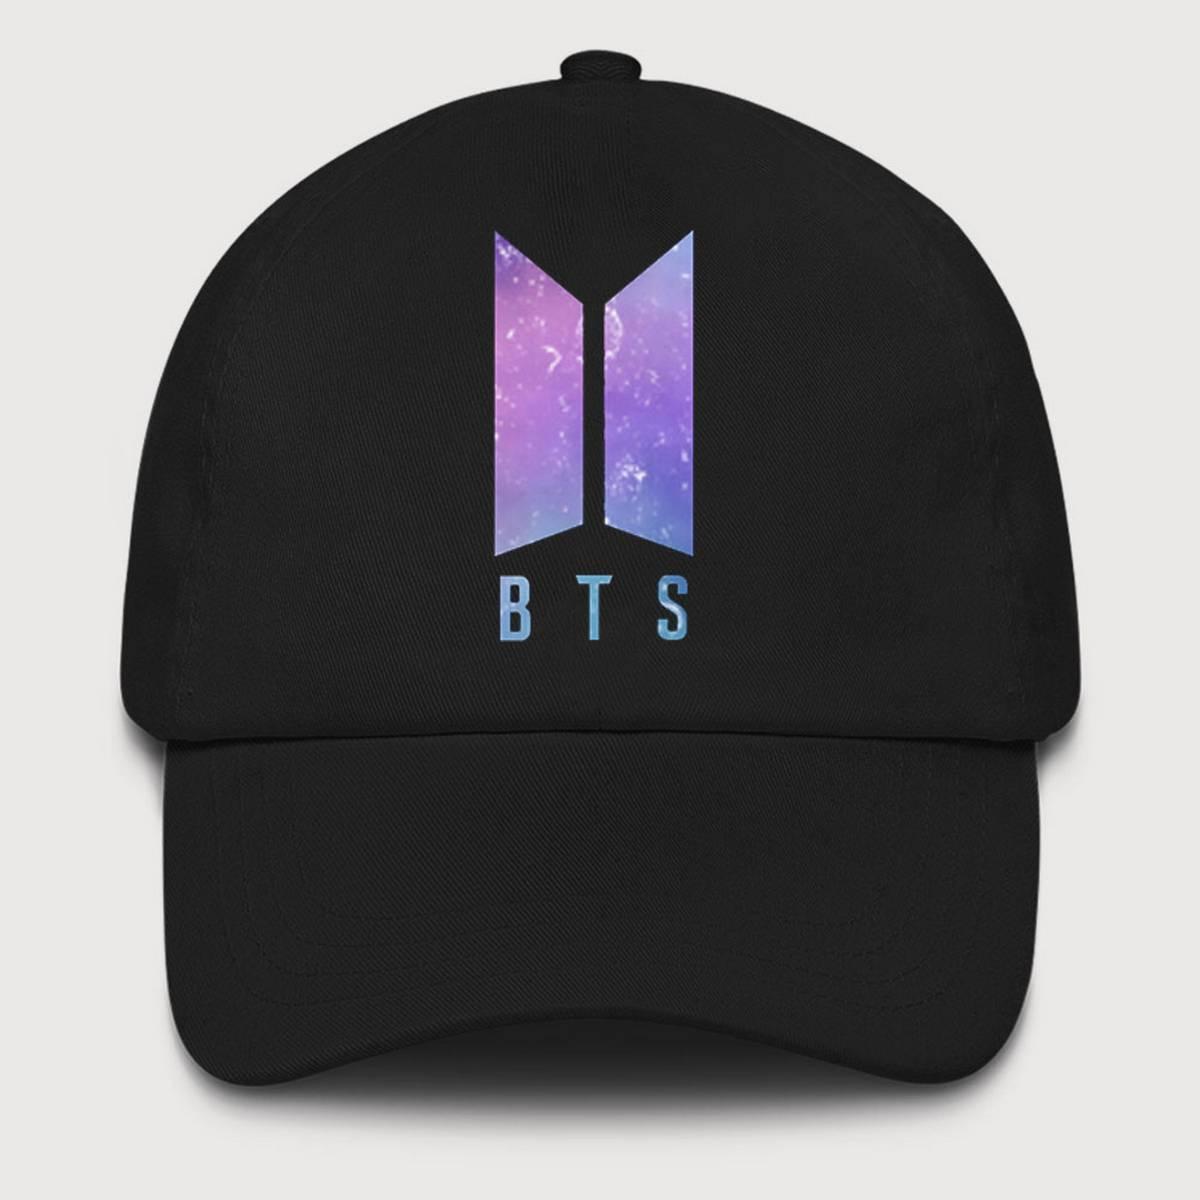 BTS Army Cap for Men Women Adjustable Baseball Hats South Korean Band Lover